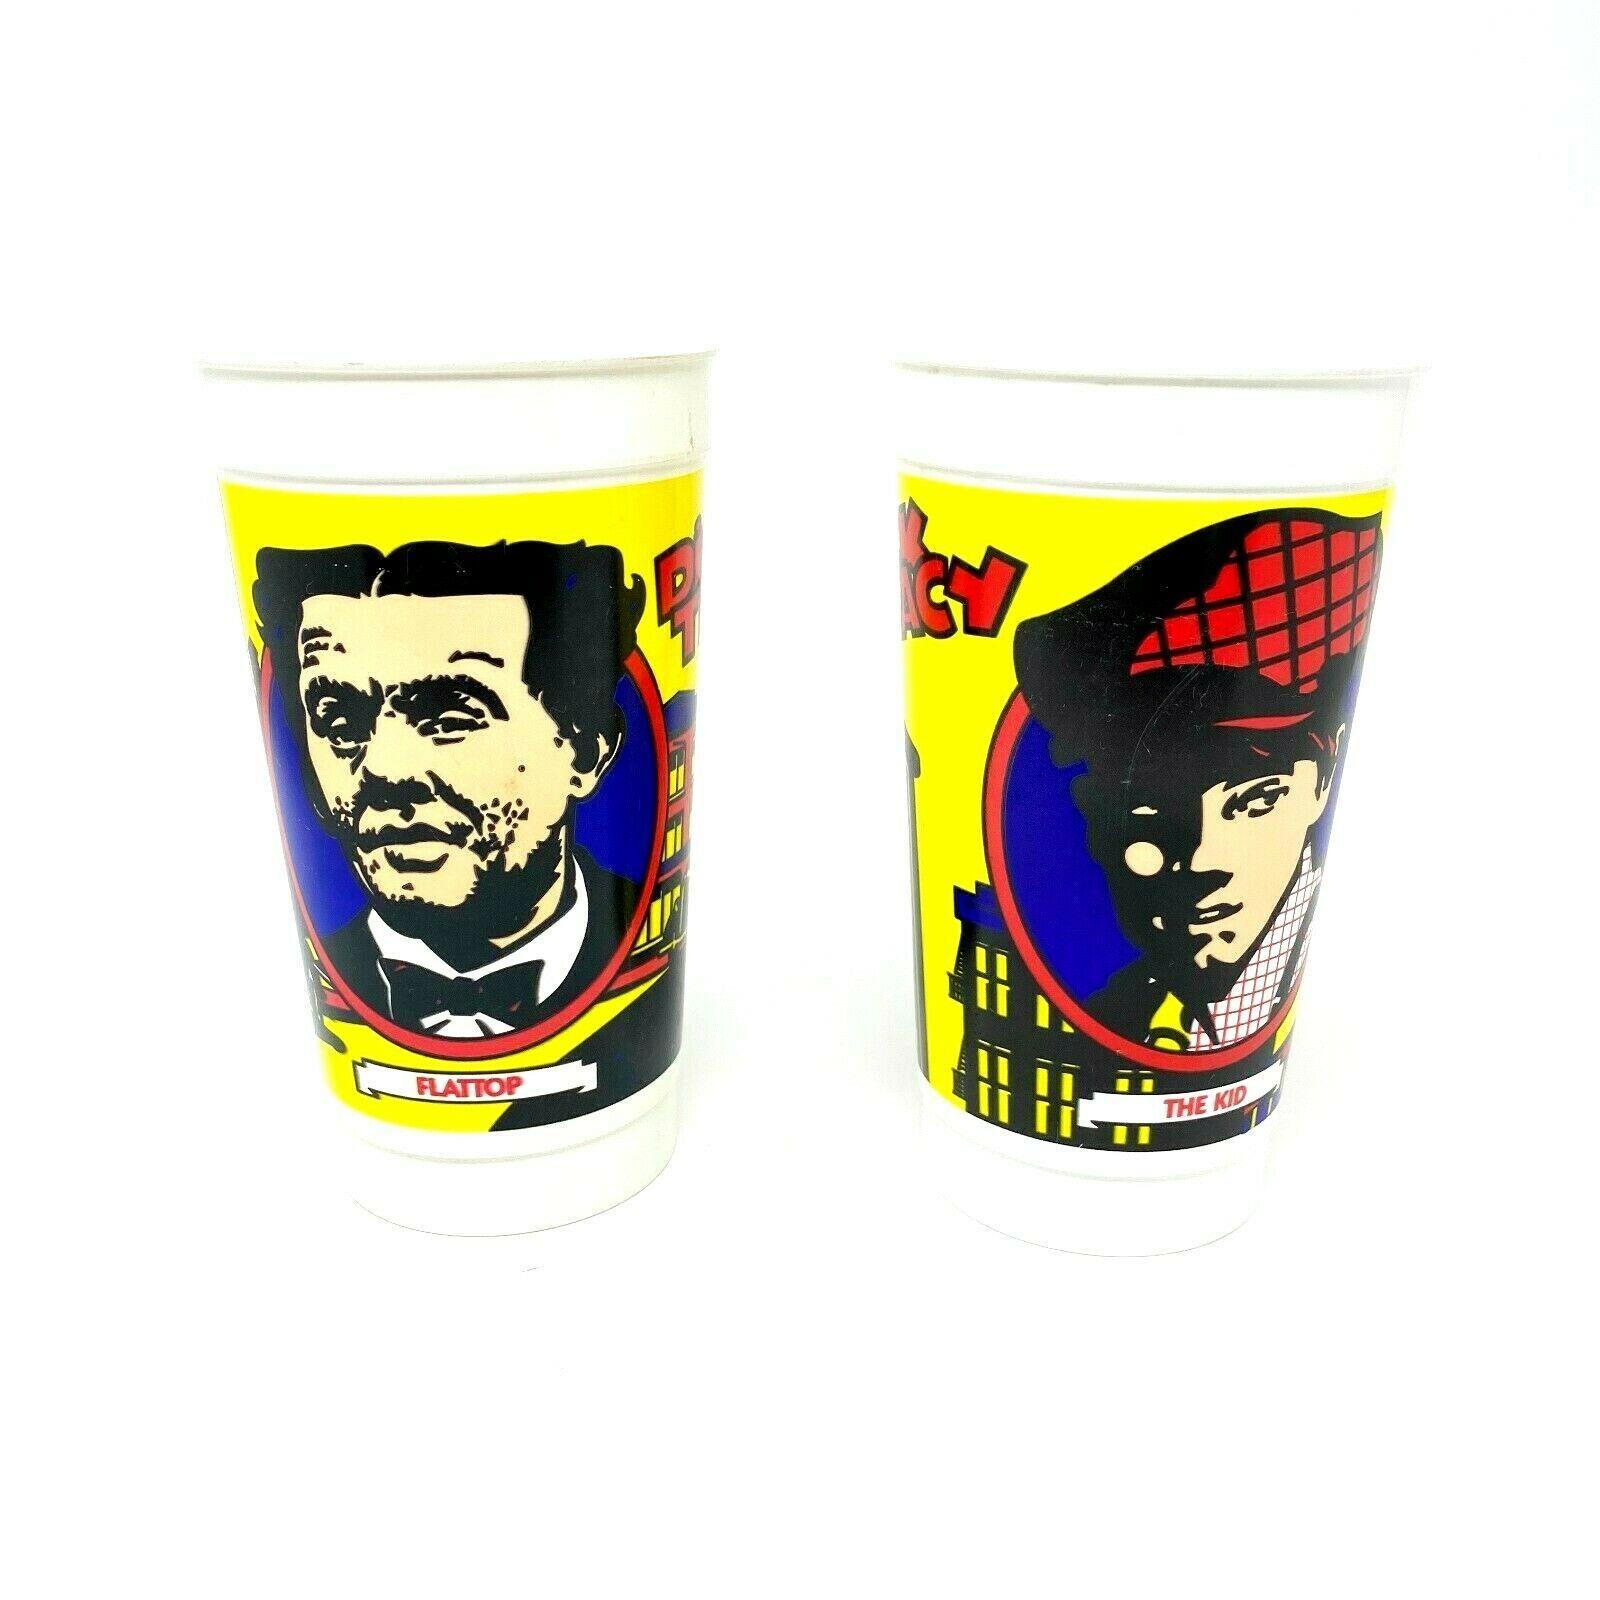 McDonalds Dick Tracy Flat Top The Kid Bundle Vintage1990 Set of 2 Plastic Cups - $19.77